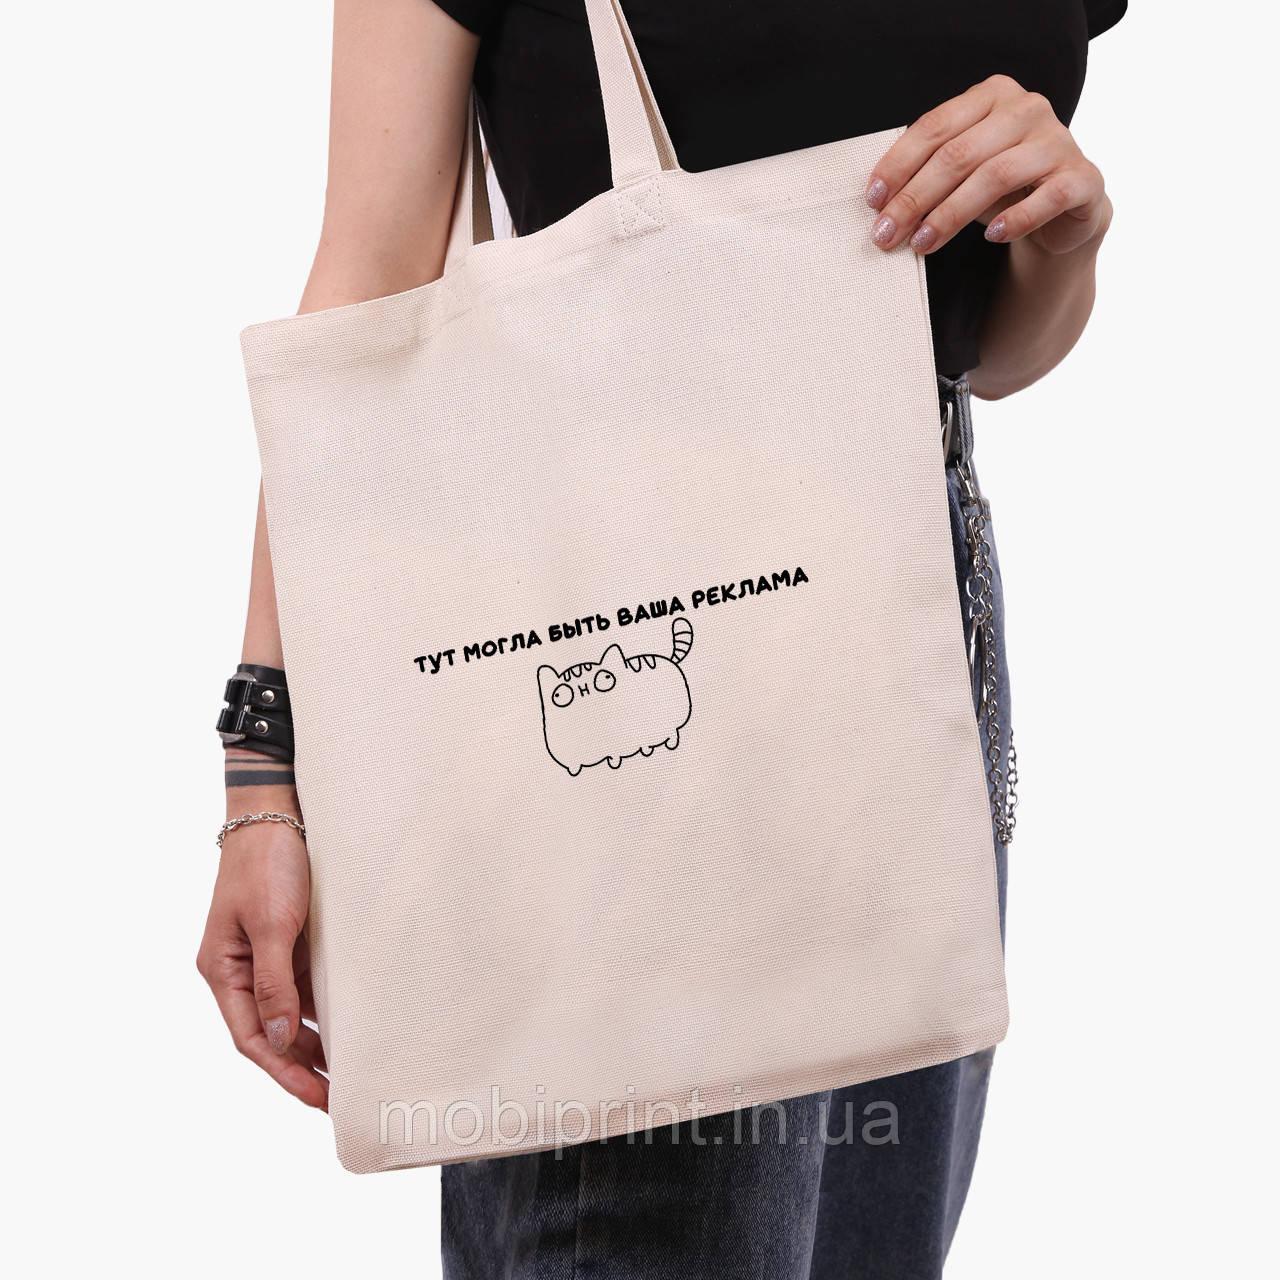 Эко сумка шоппер Тут могла быть ваша реклама (Your ad could be here) (9227-1366)  экосумка шопер 41*35 см